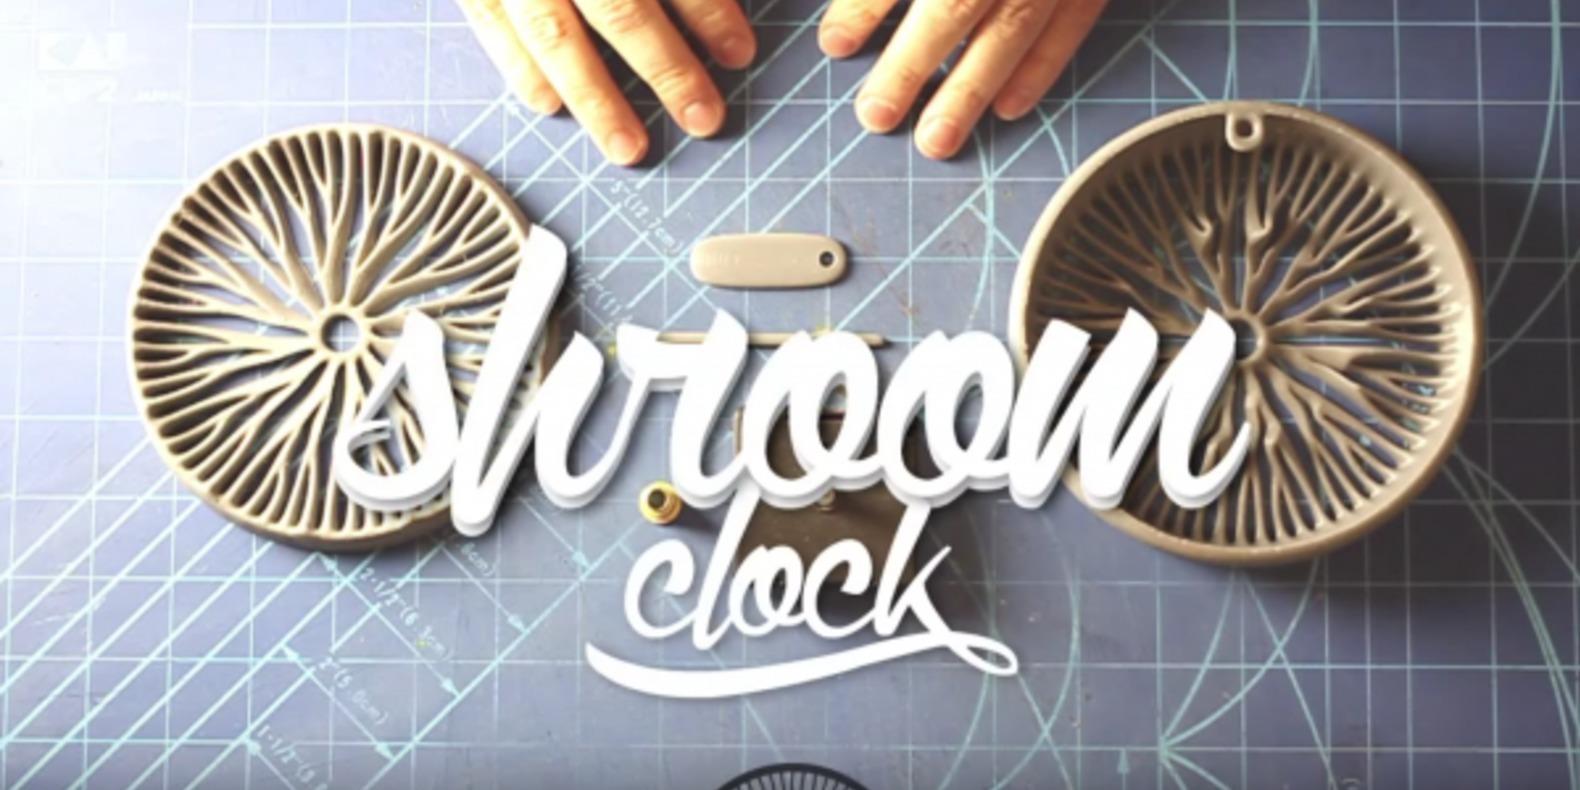 http://fichier3d.fr/wp-content/uploads/2016/04/shroom-clock-pekka-salokannel-3D-printed-horloge-heure-cults-fichier-3D-4.png